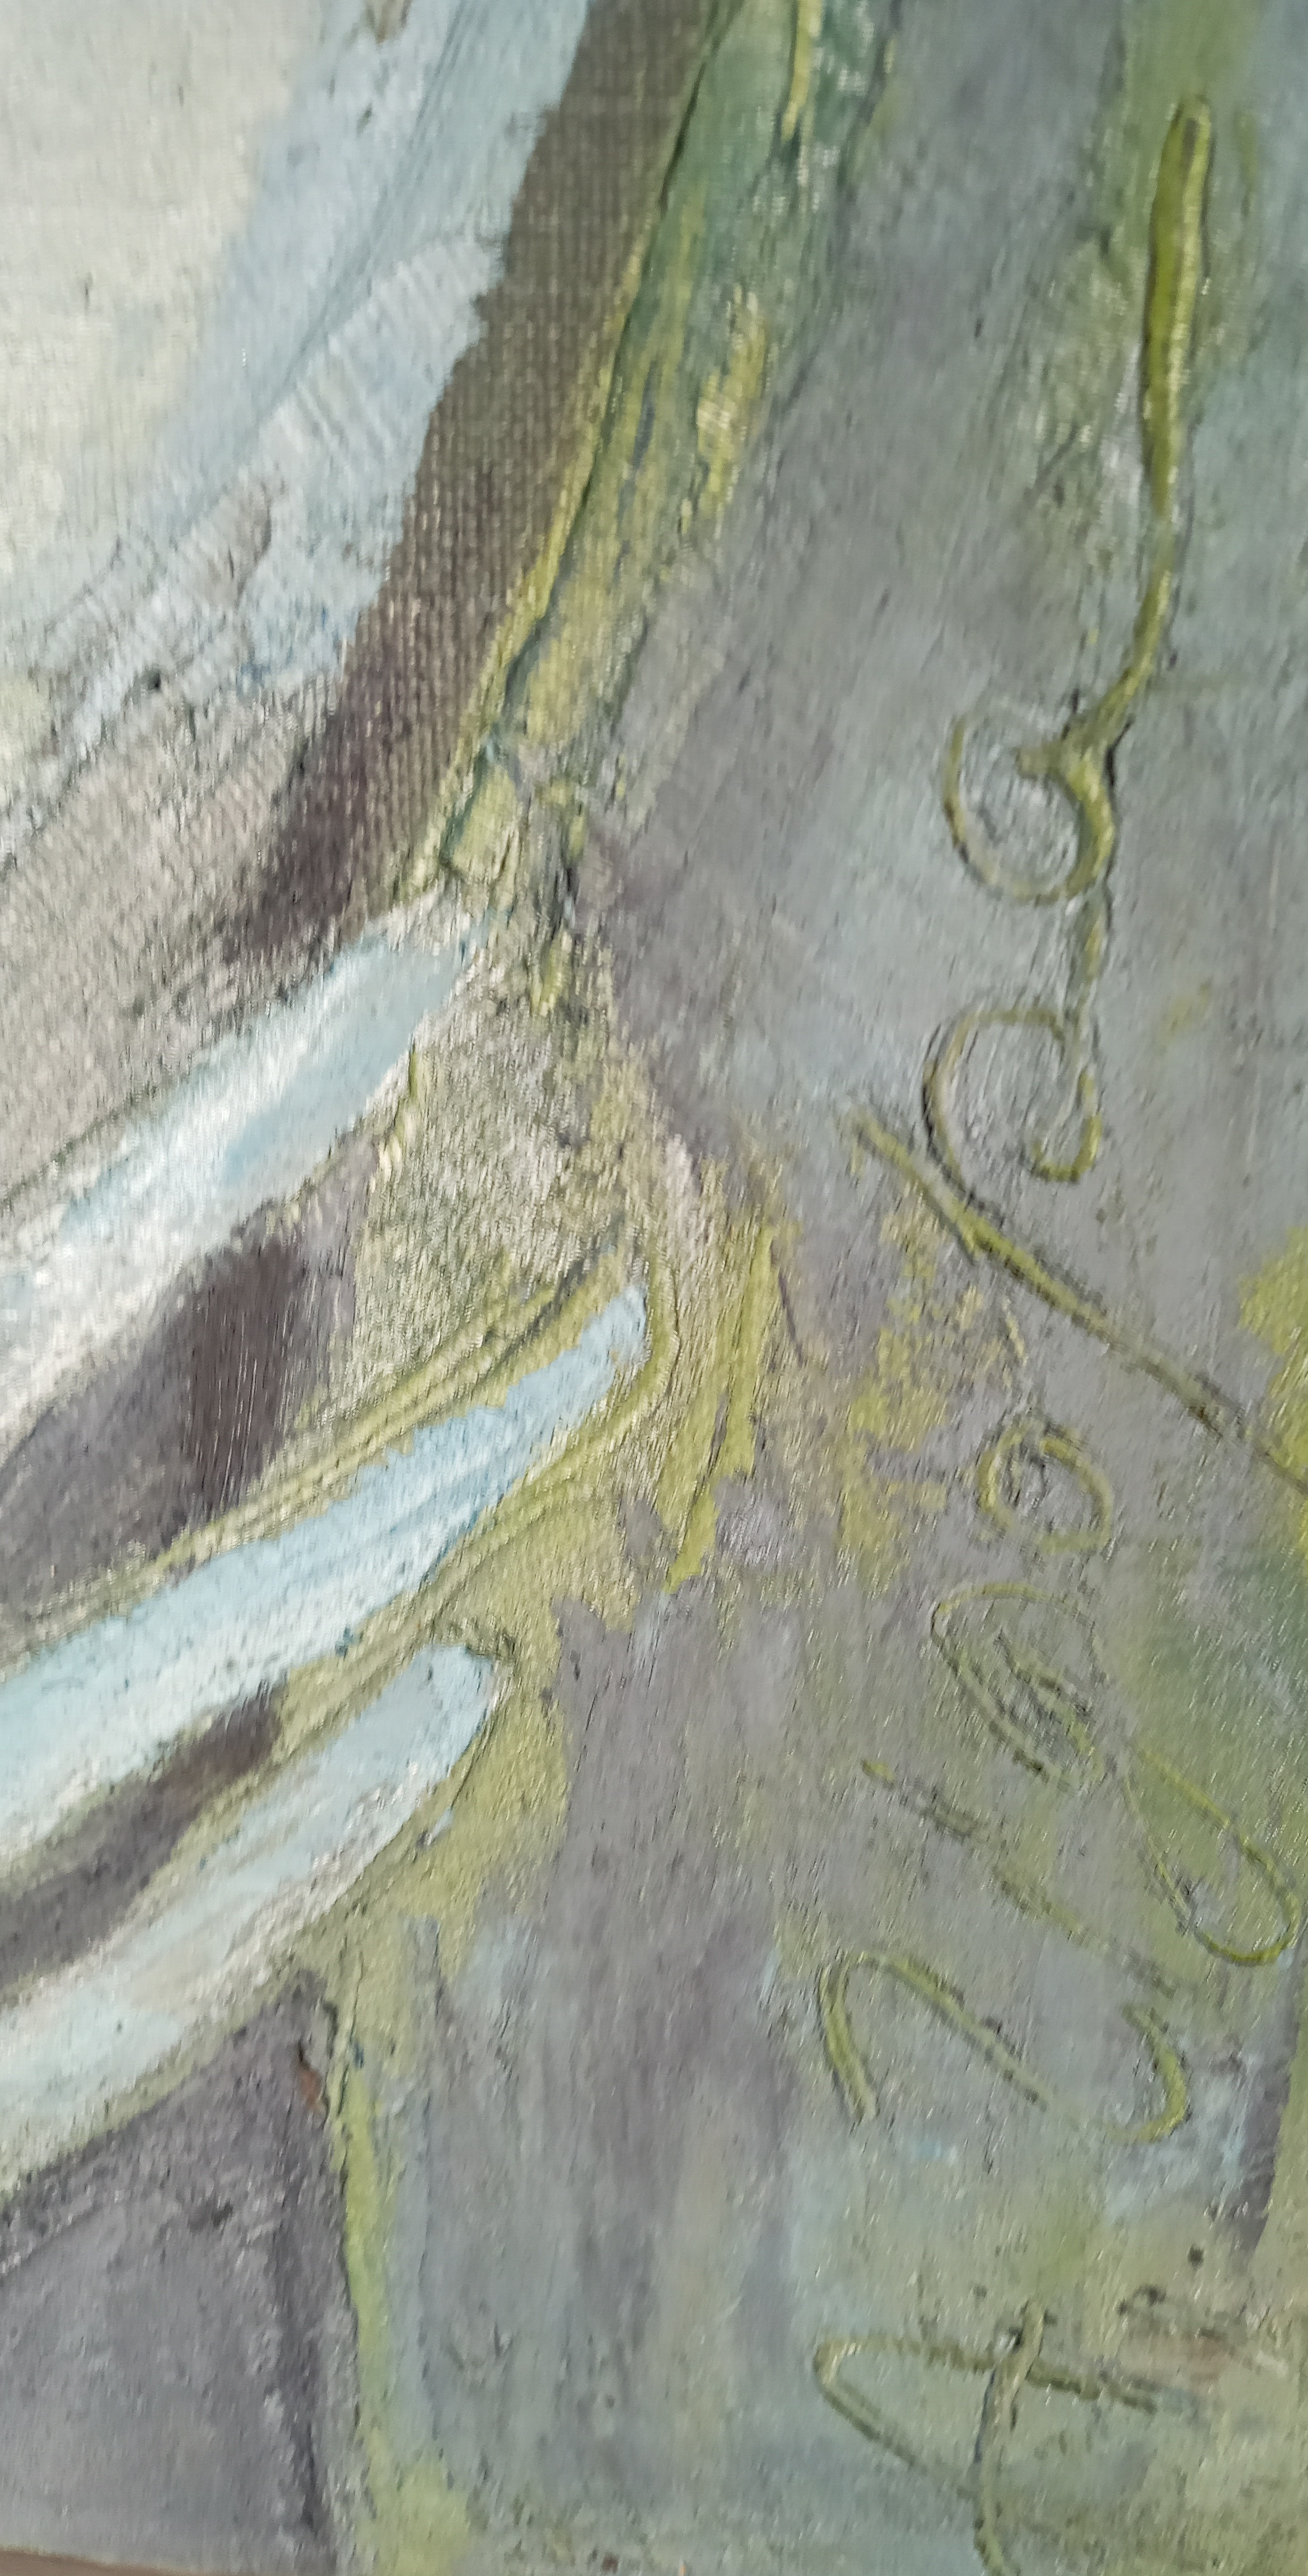 Улыбаясь синева 70-50 см., холст, масло  2005 год  - 1